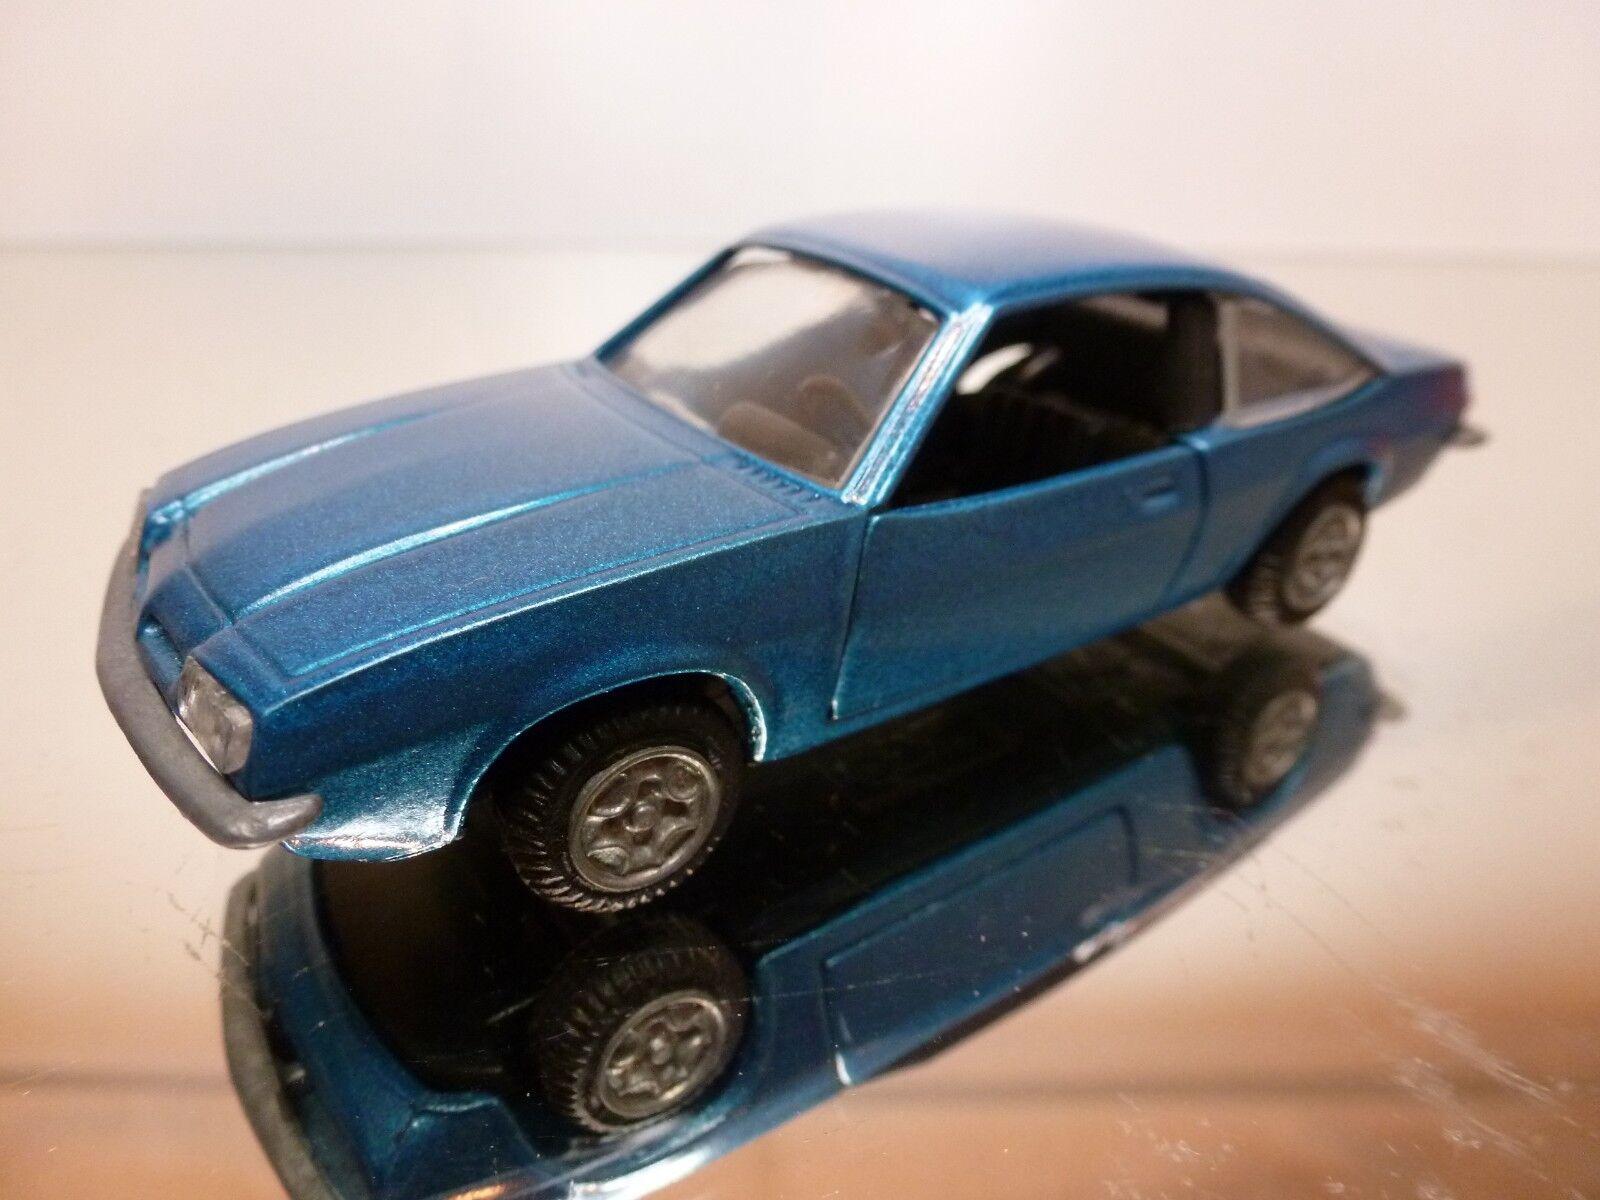 DEALER GM OPEL MANTA - blueE METALLIC 1 43 - GOOD CONDITION